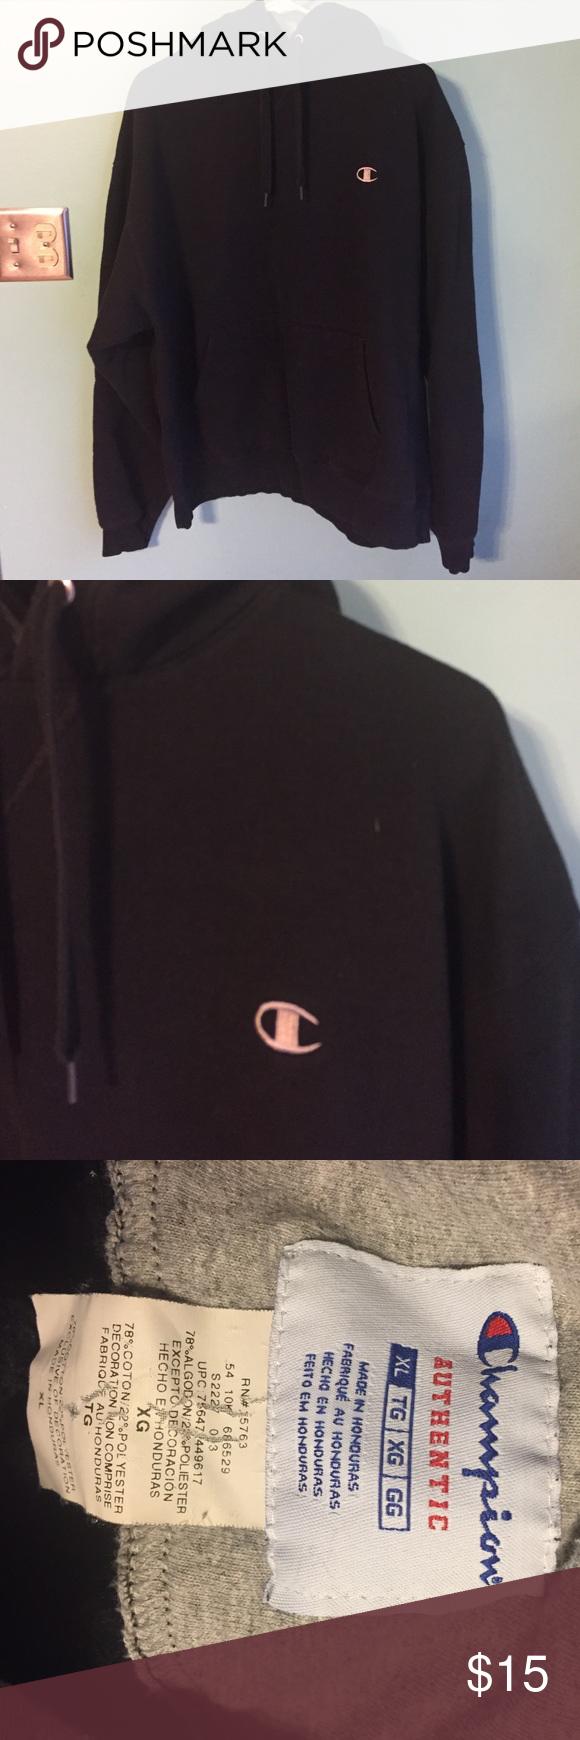 Men's black hoodie Sz XL Men's black hoodie Sz XL. In excellent condition. Champion. Champion Shirts Sweatshirts & Hoodies